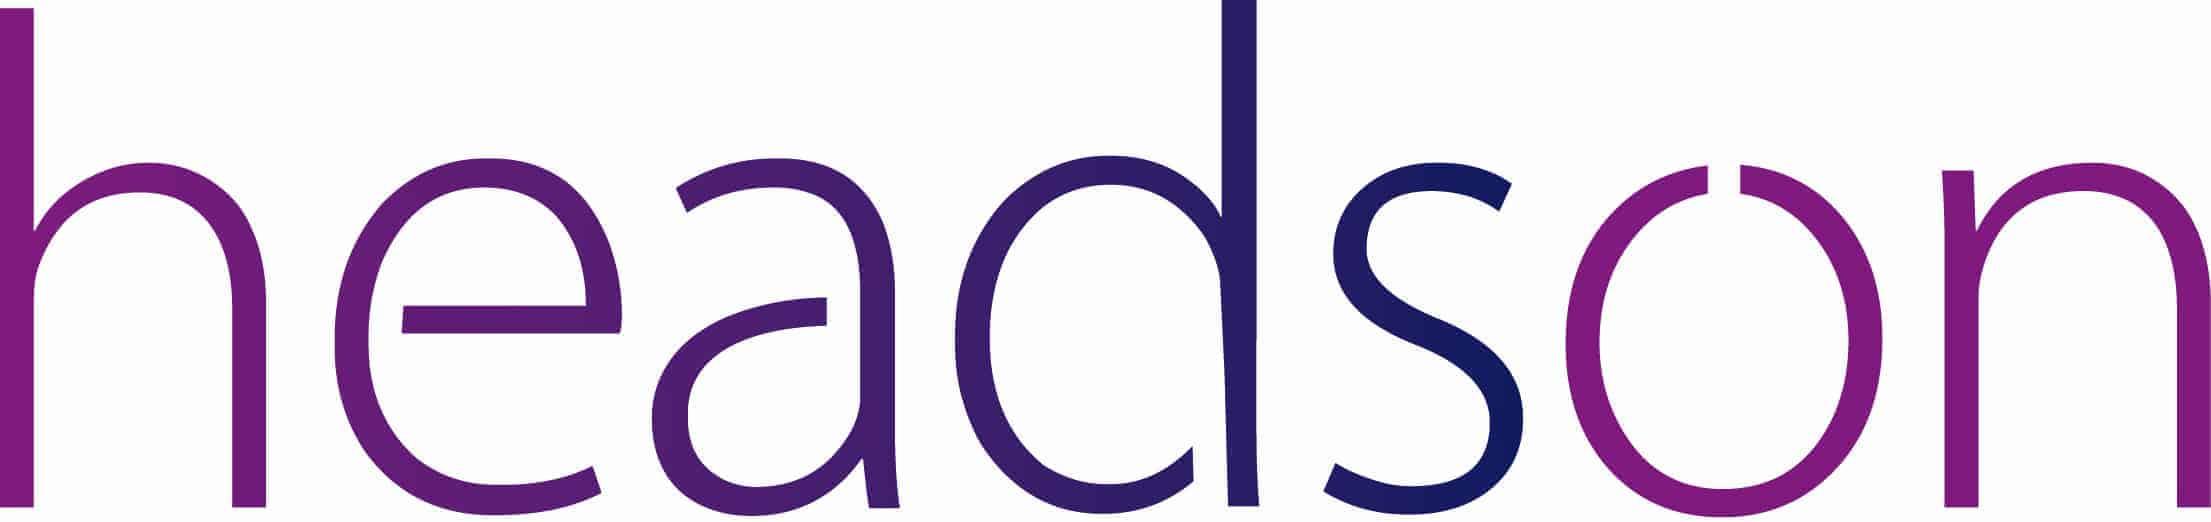 Headson logo